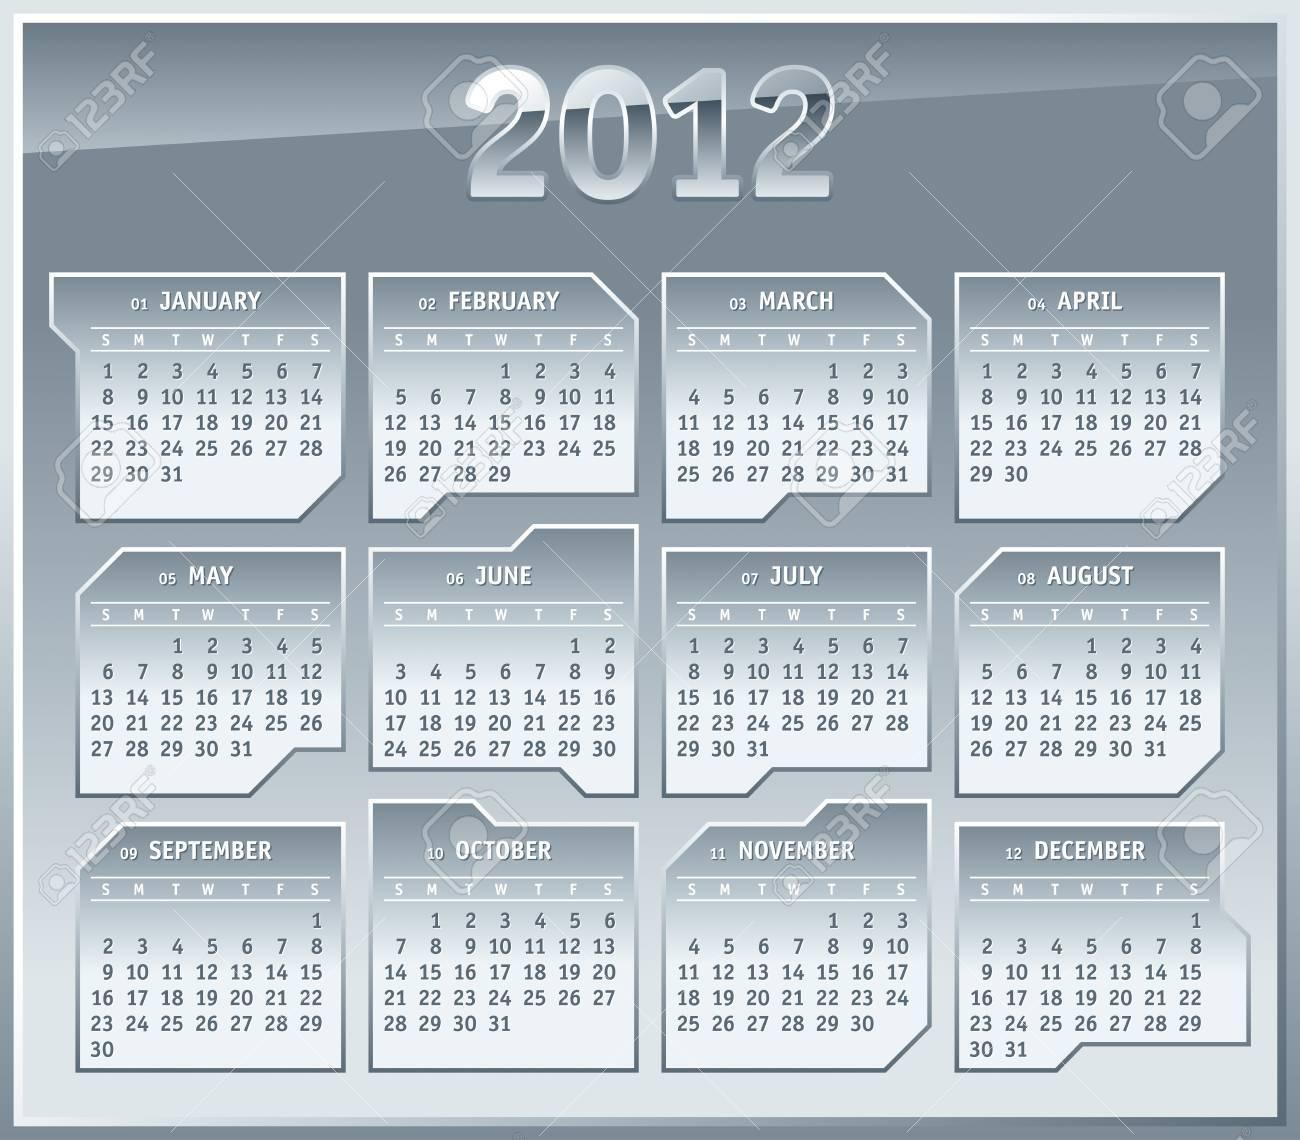 2012 Calendar Grid Template Silver Metallic Plates Design Royalty